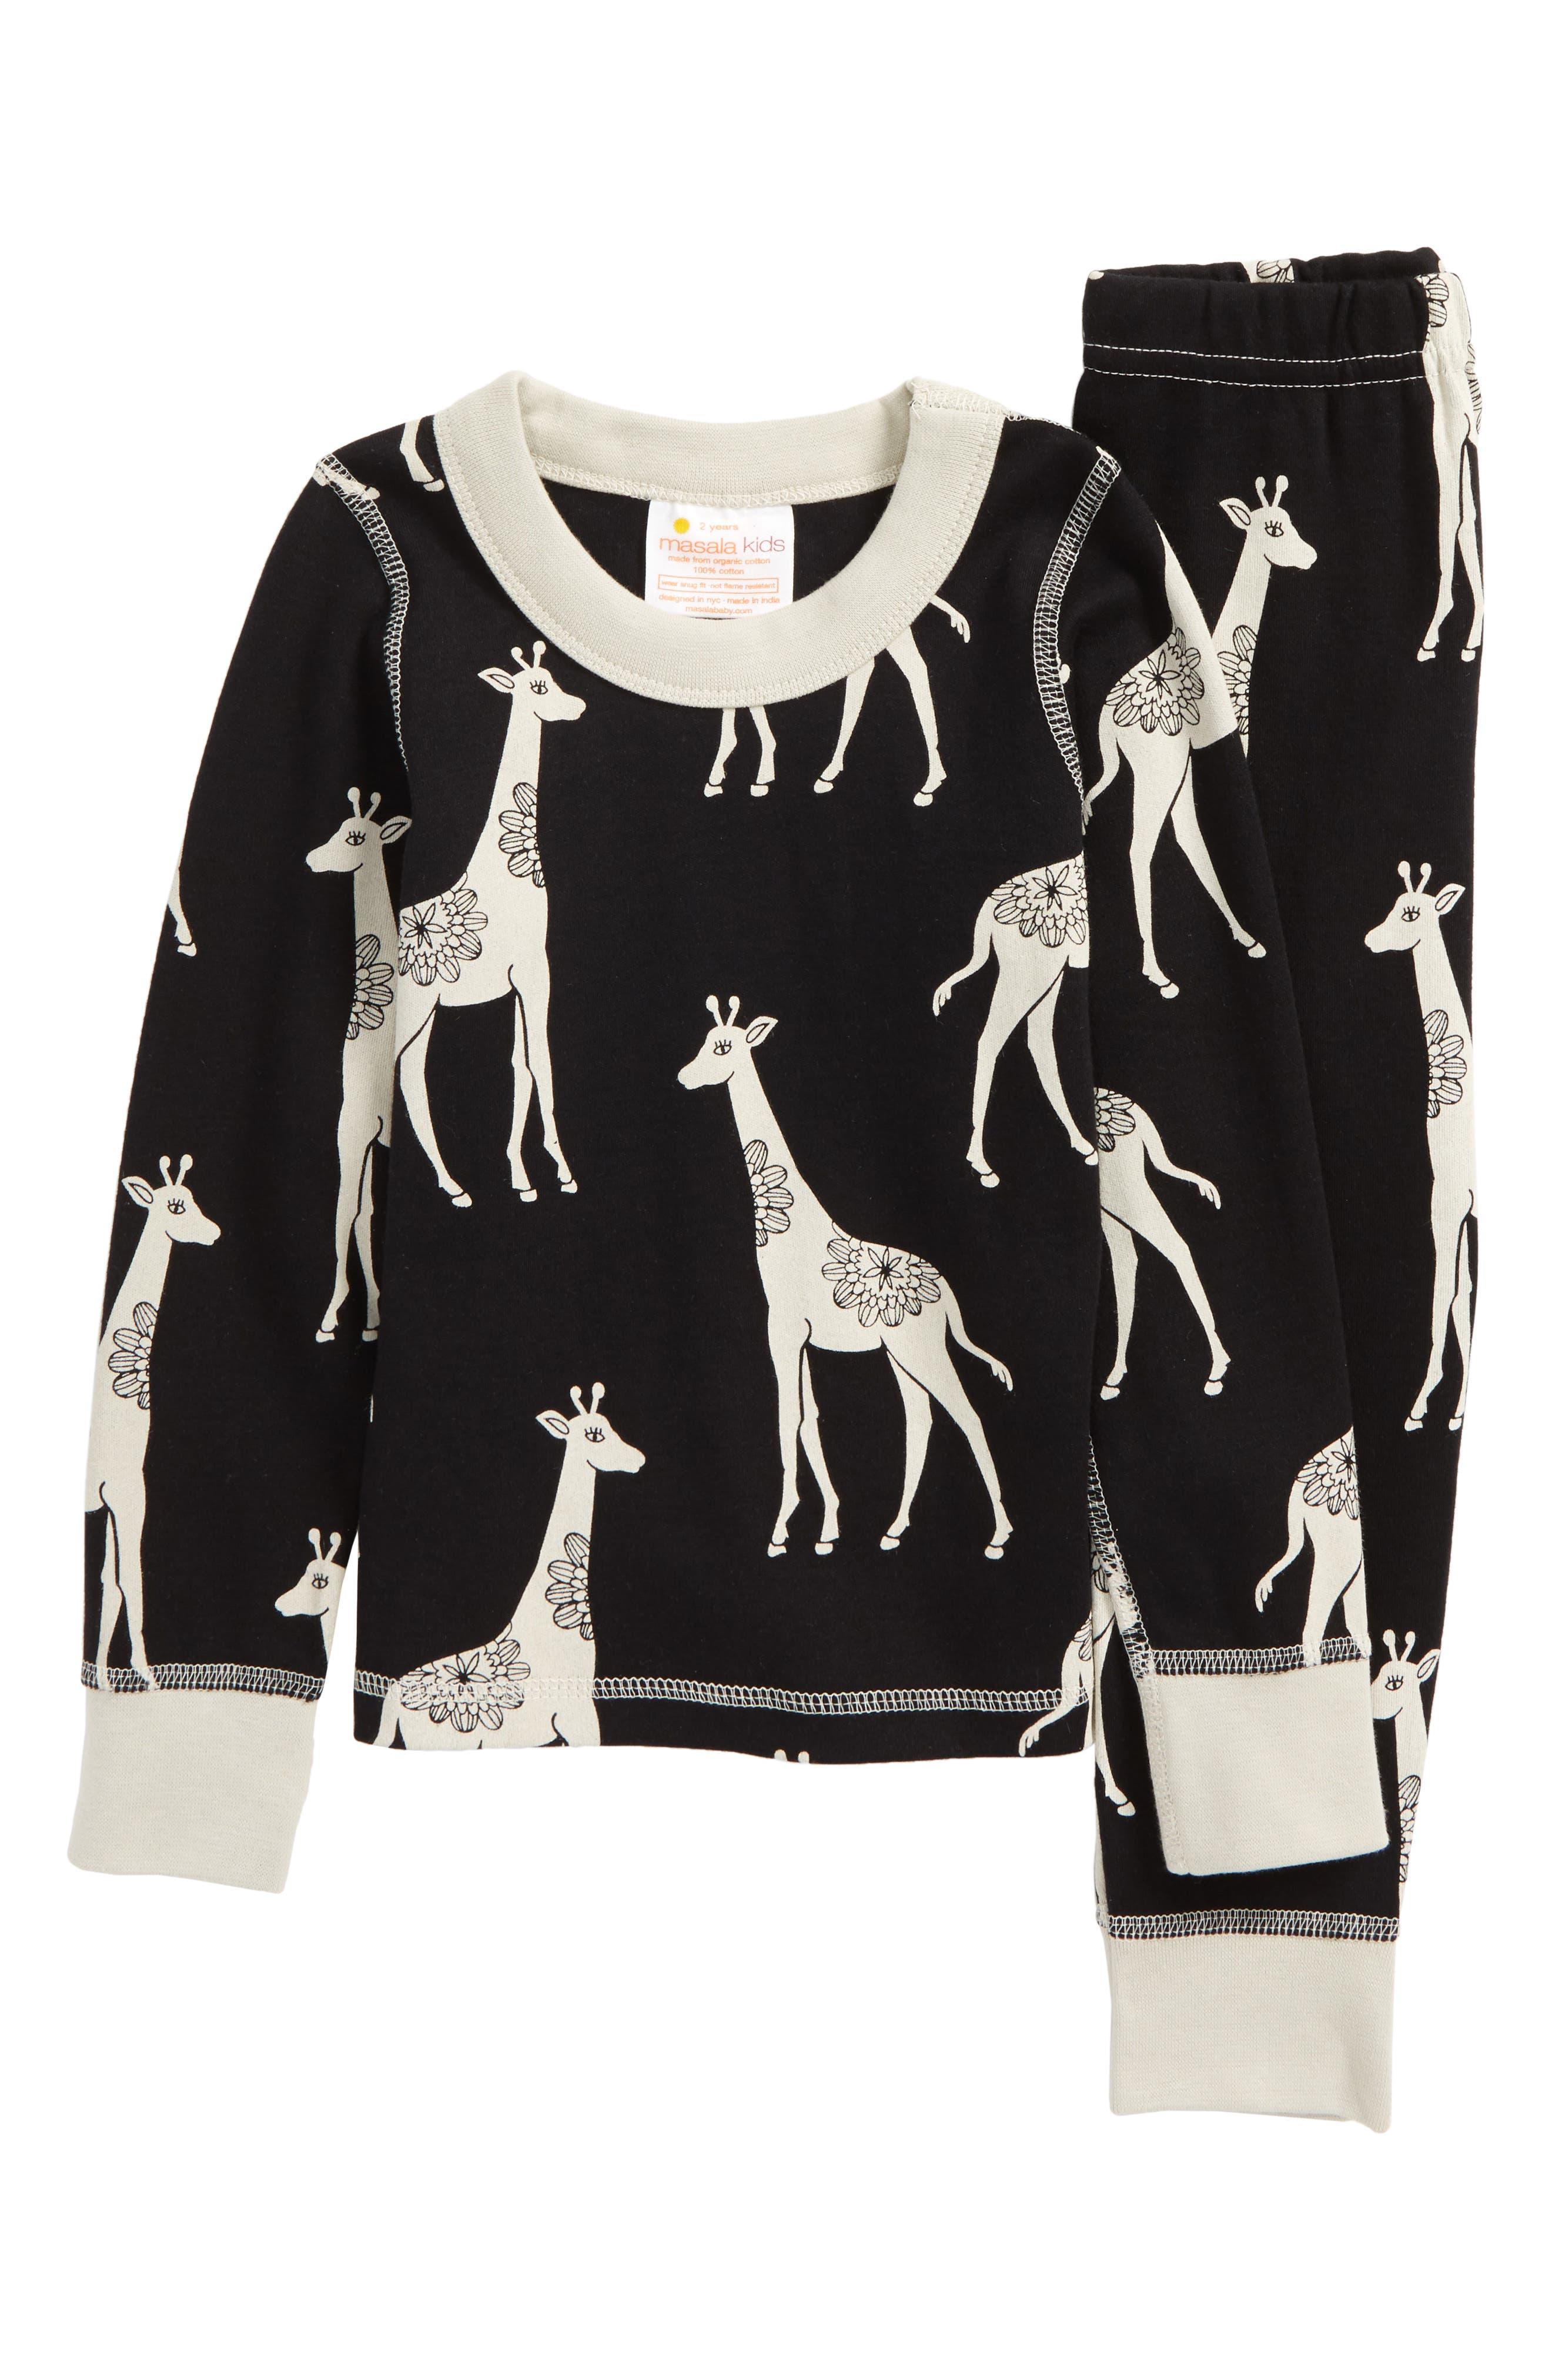 Alternate Image 1 Selected - Masalababy Giraffe Organic Cotton Fitted Two-Piece Pajamas (Toddler Kids, Little Kids & Big Kids)